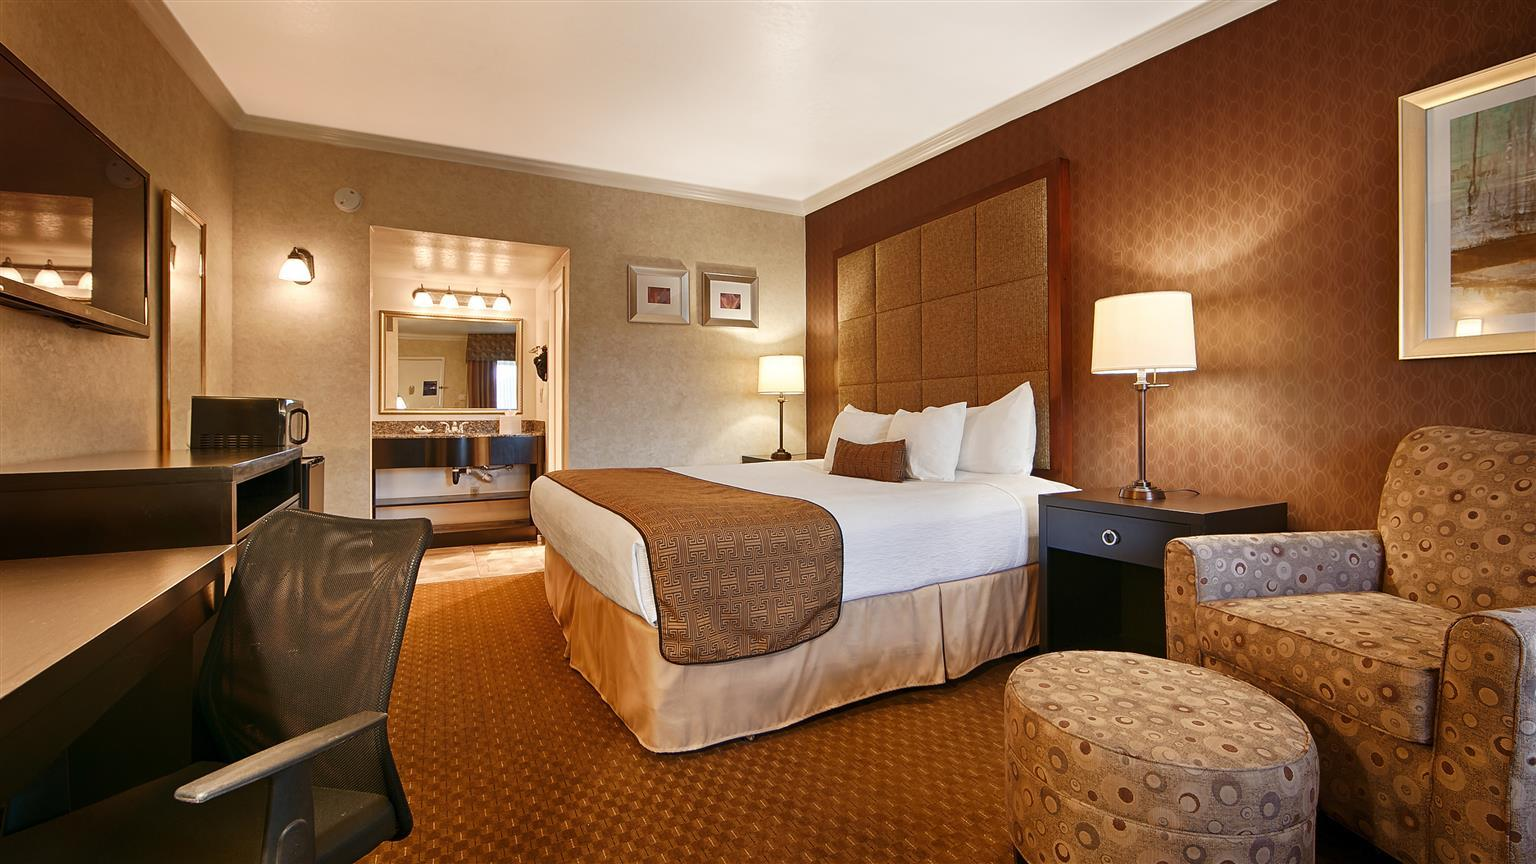 BEST WESTERN INNSUITES PHOENIX HOTEL & SUITES, PHOENIX ***